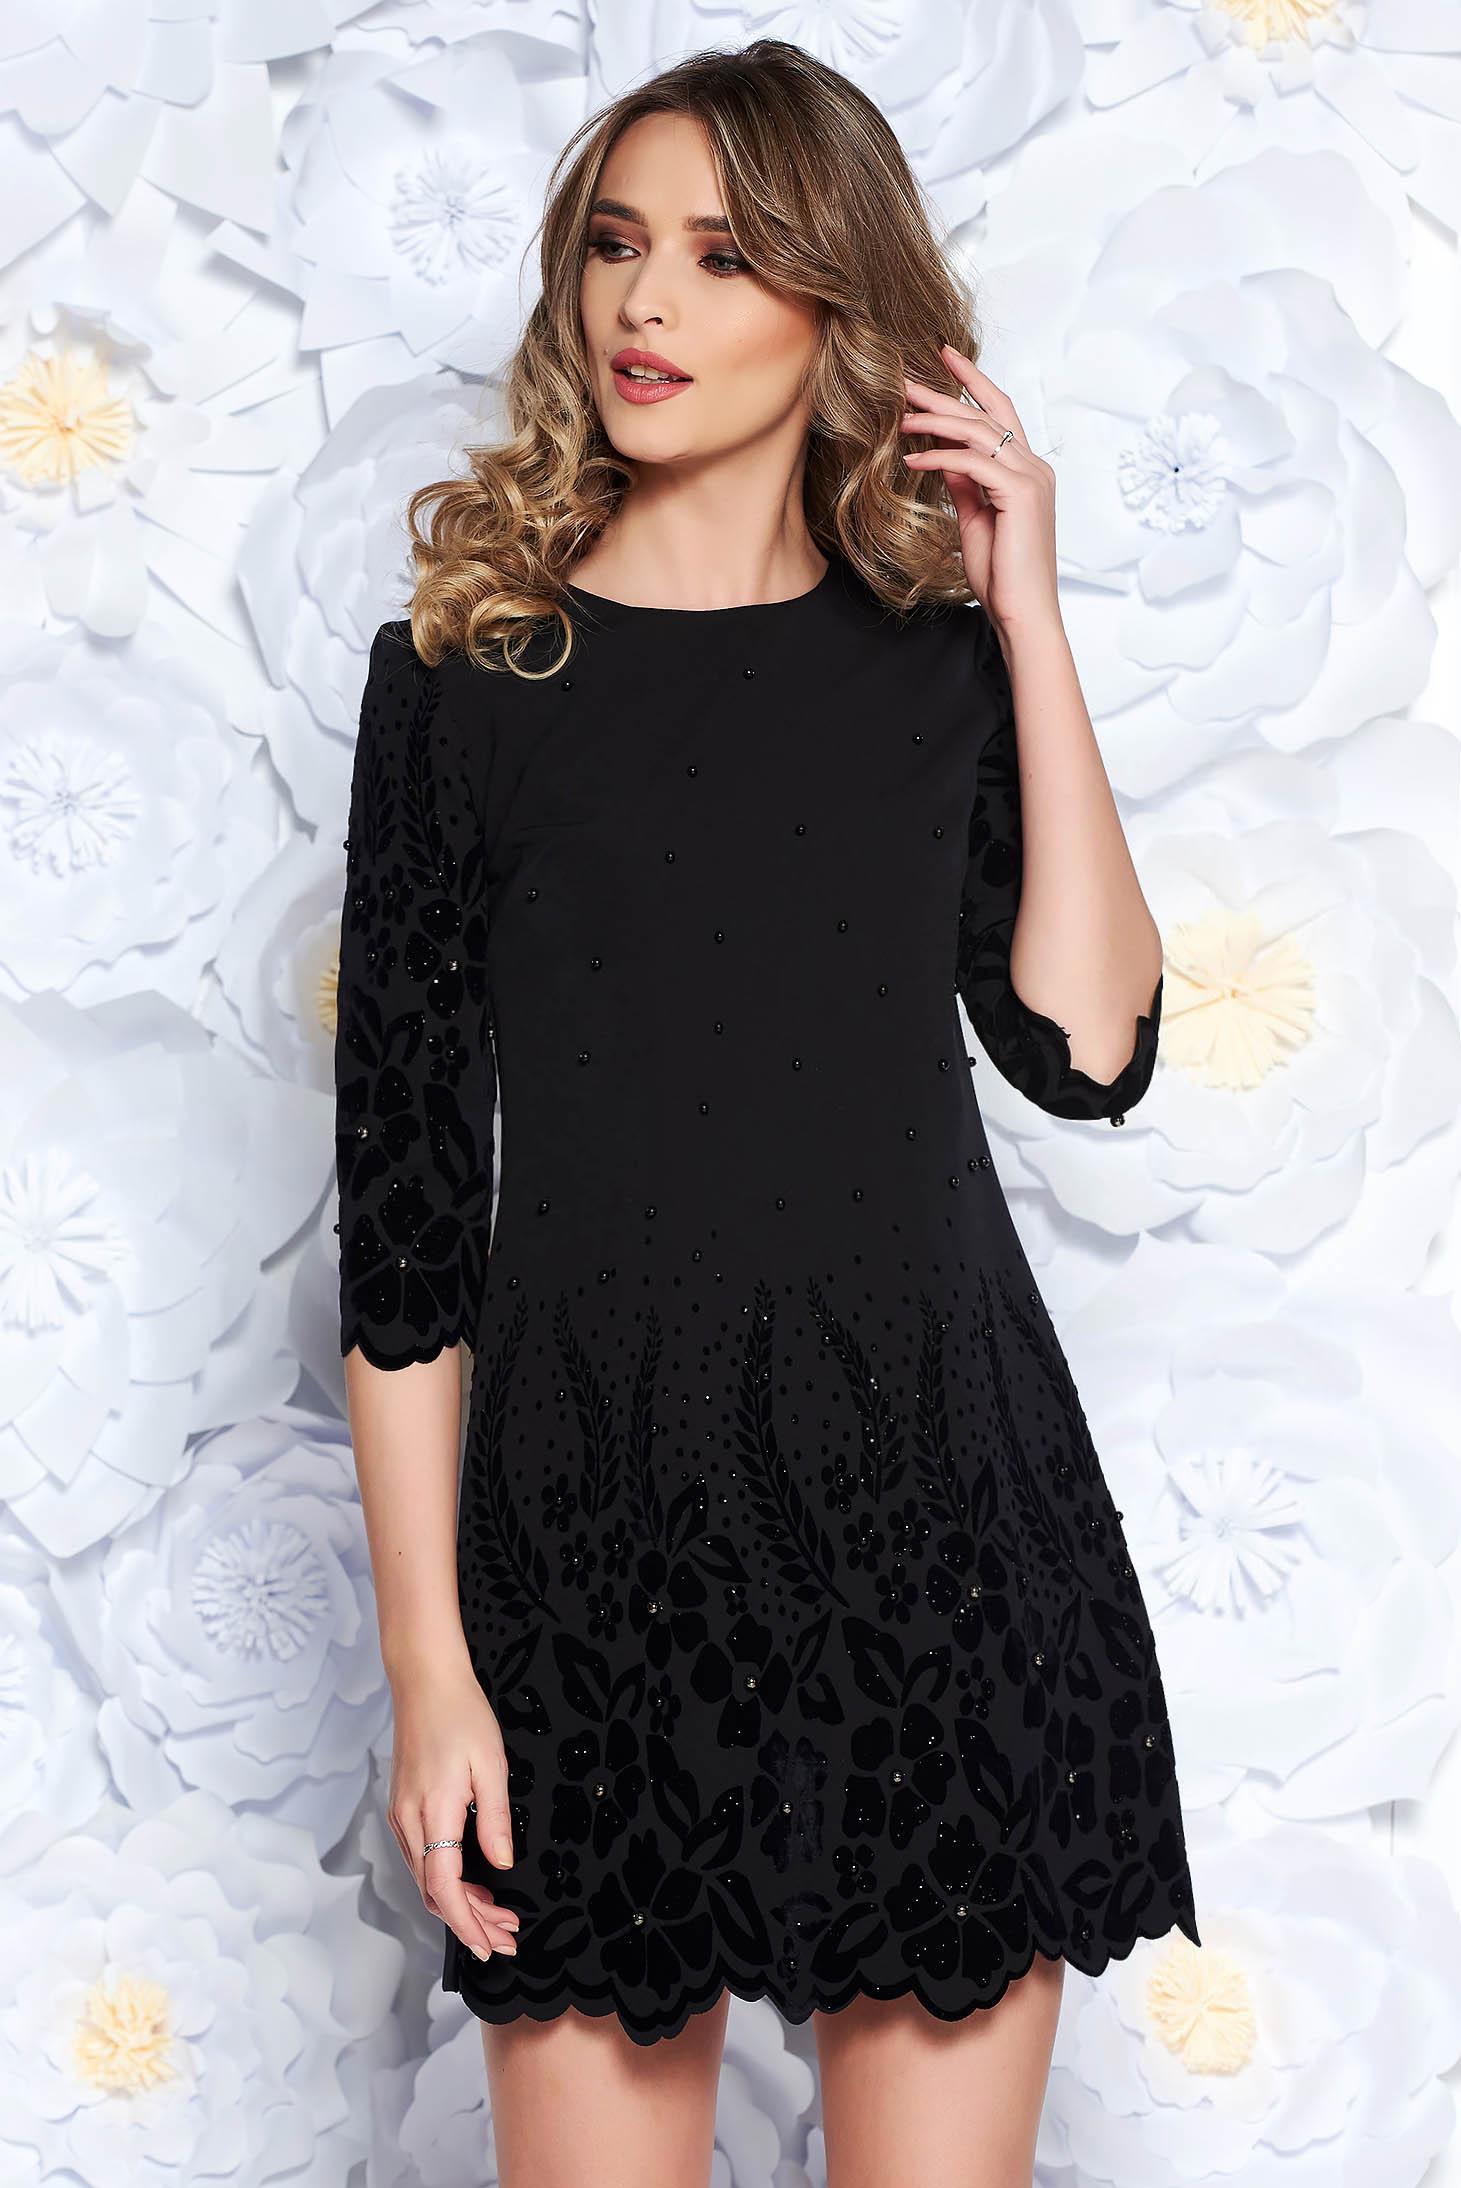 Black dress straight elegant slightly elastic fabric with pearls